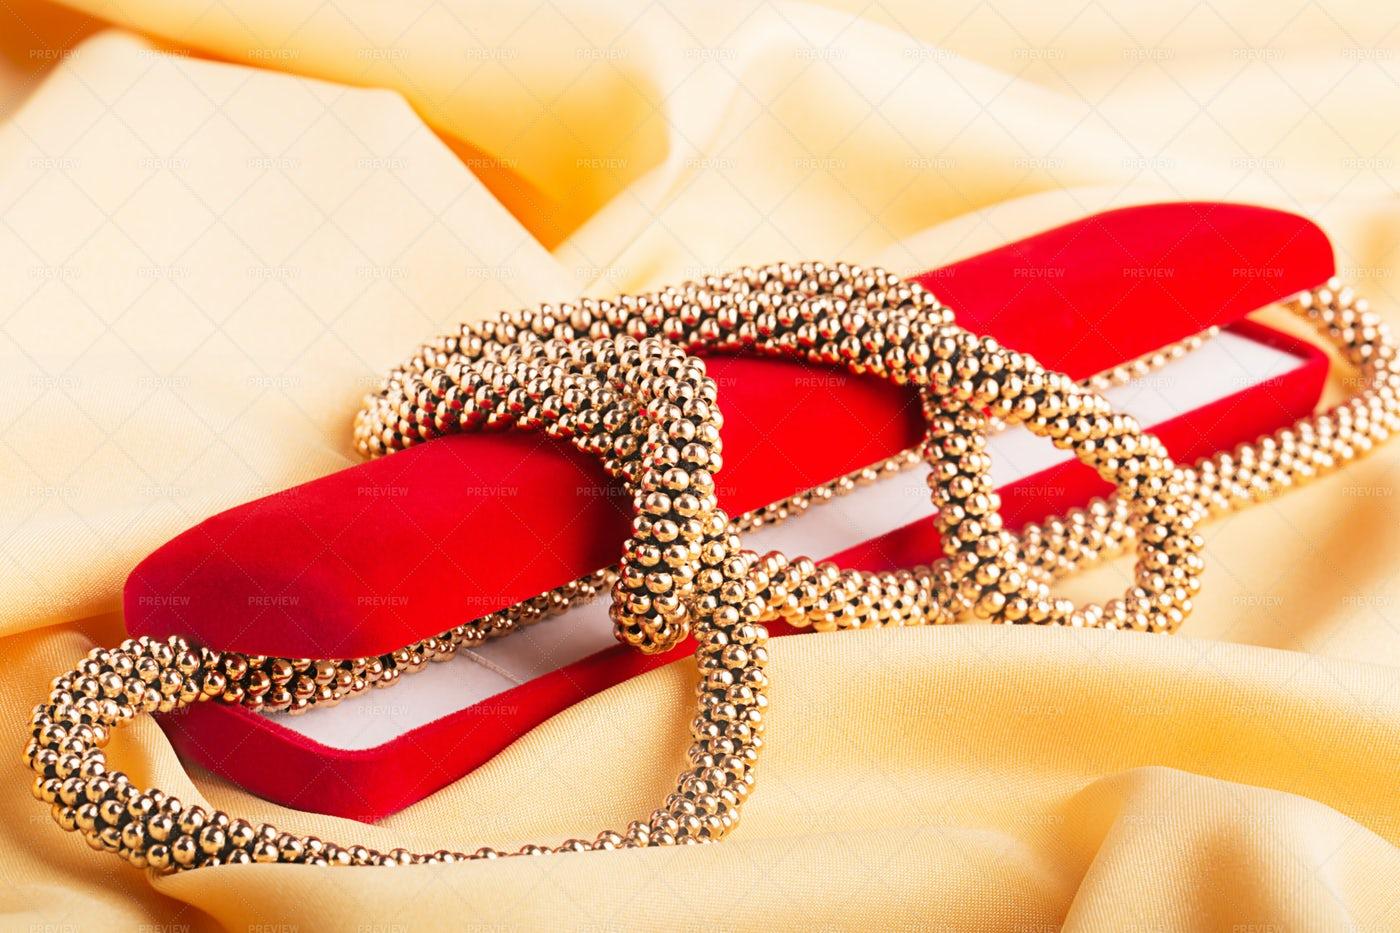 Golden Necklace And Box: Stock Photos